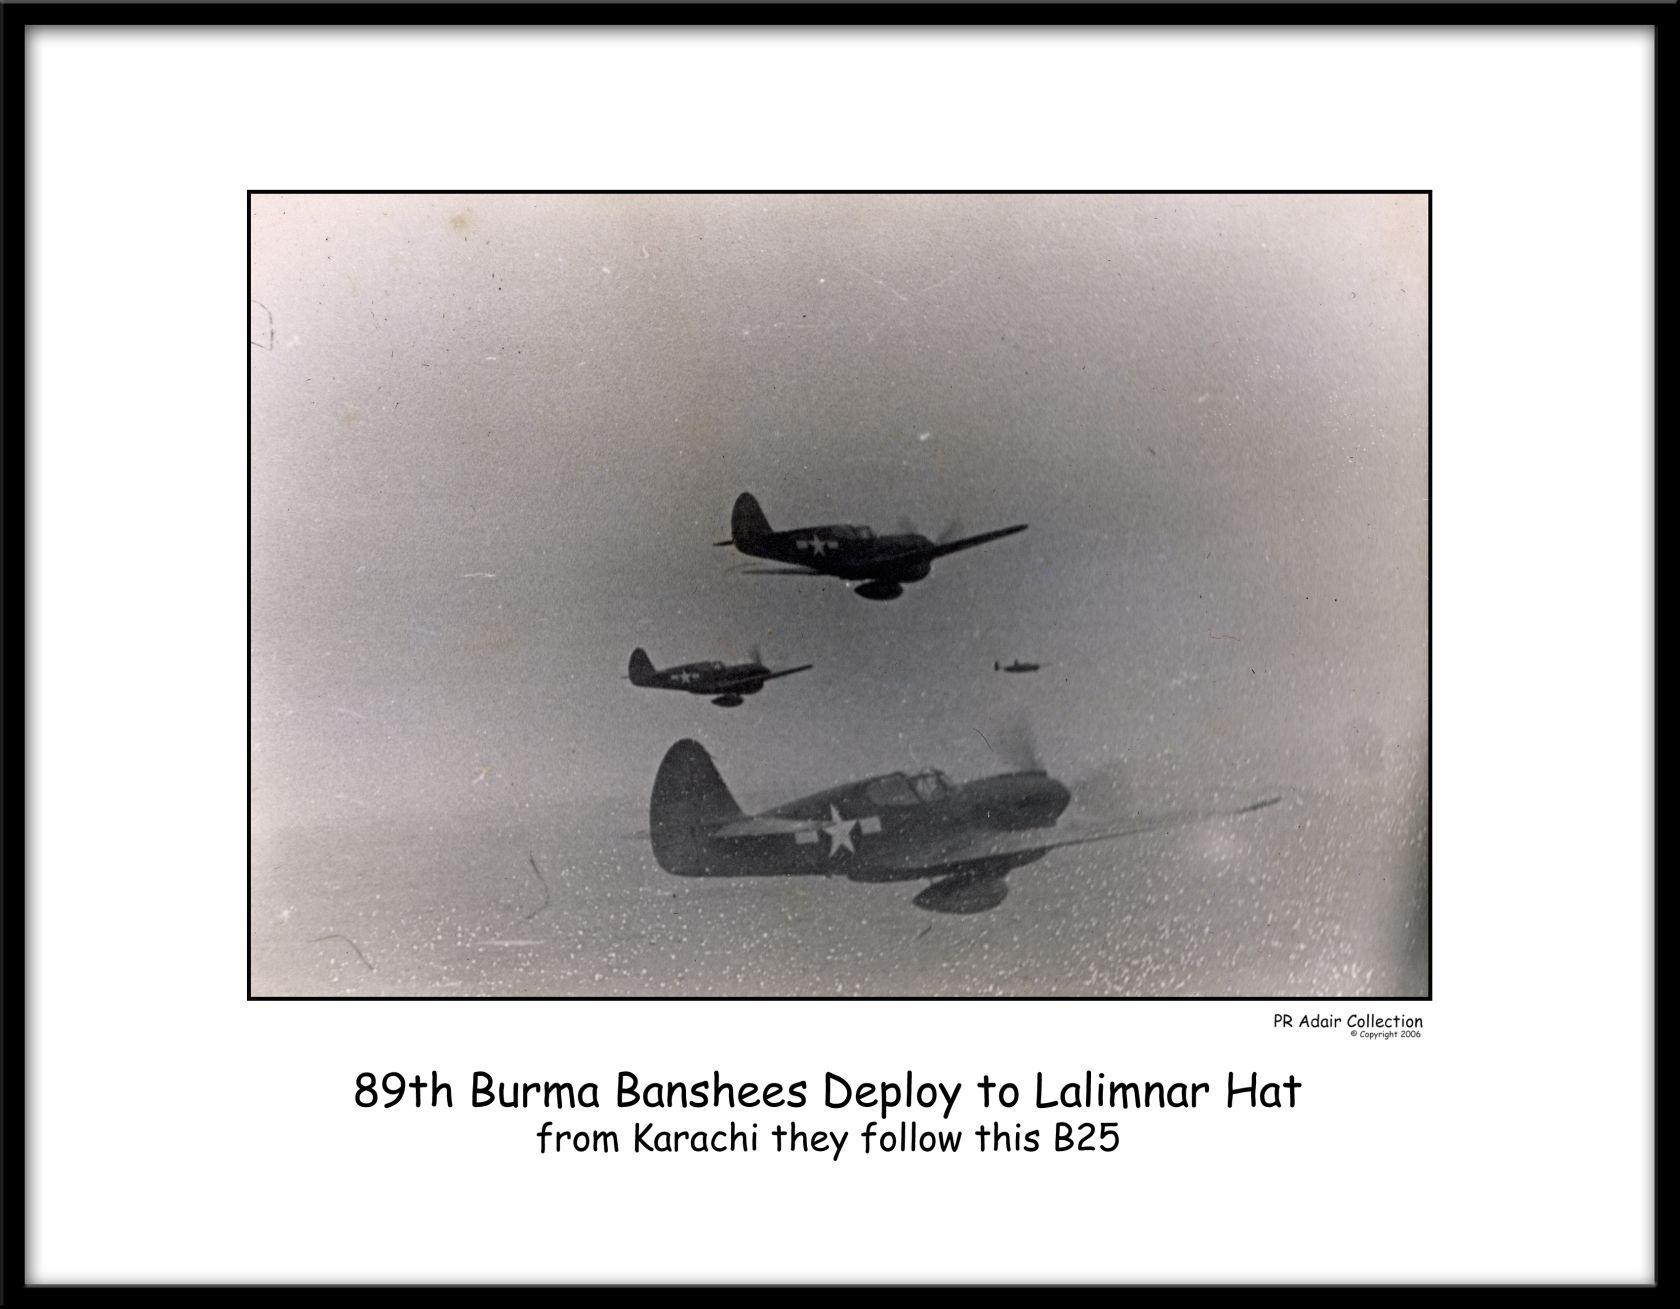 Burma Banshee 131